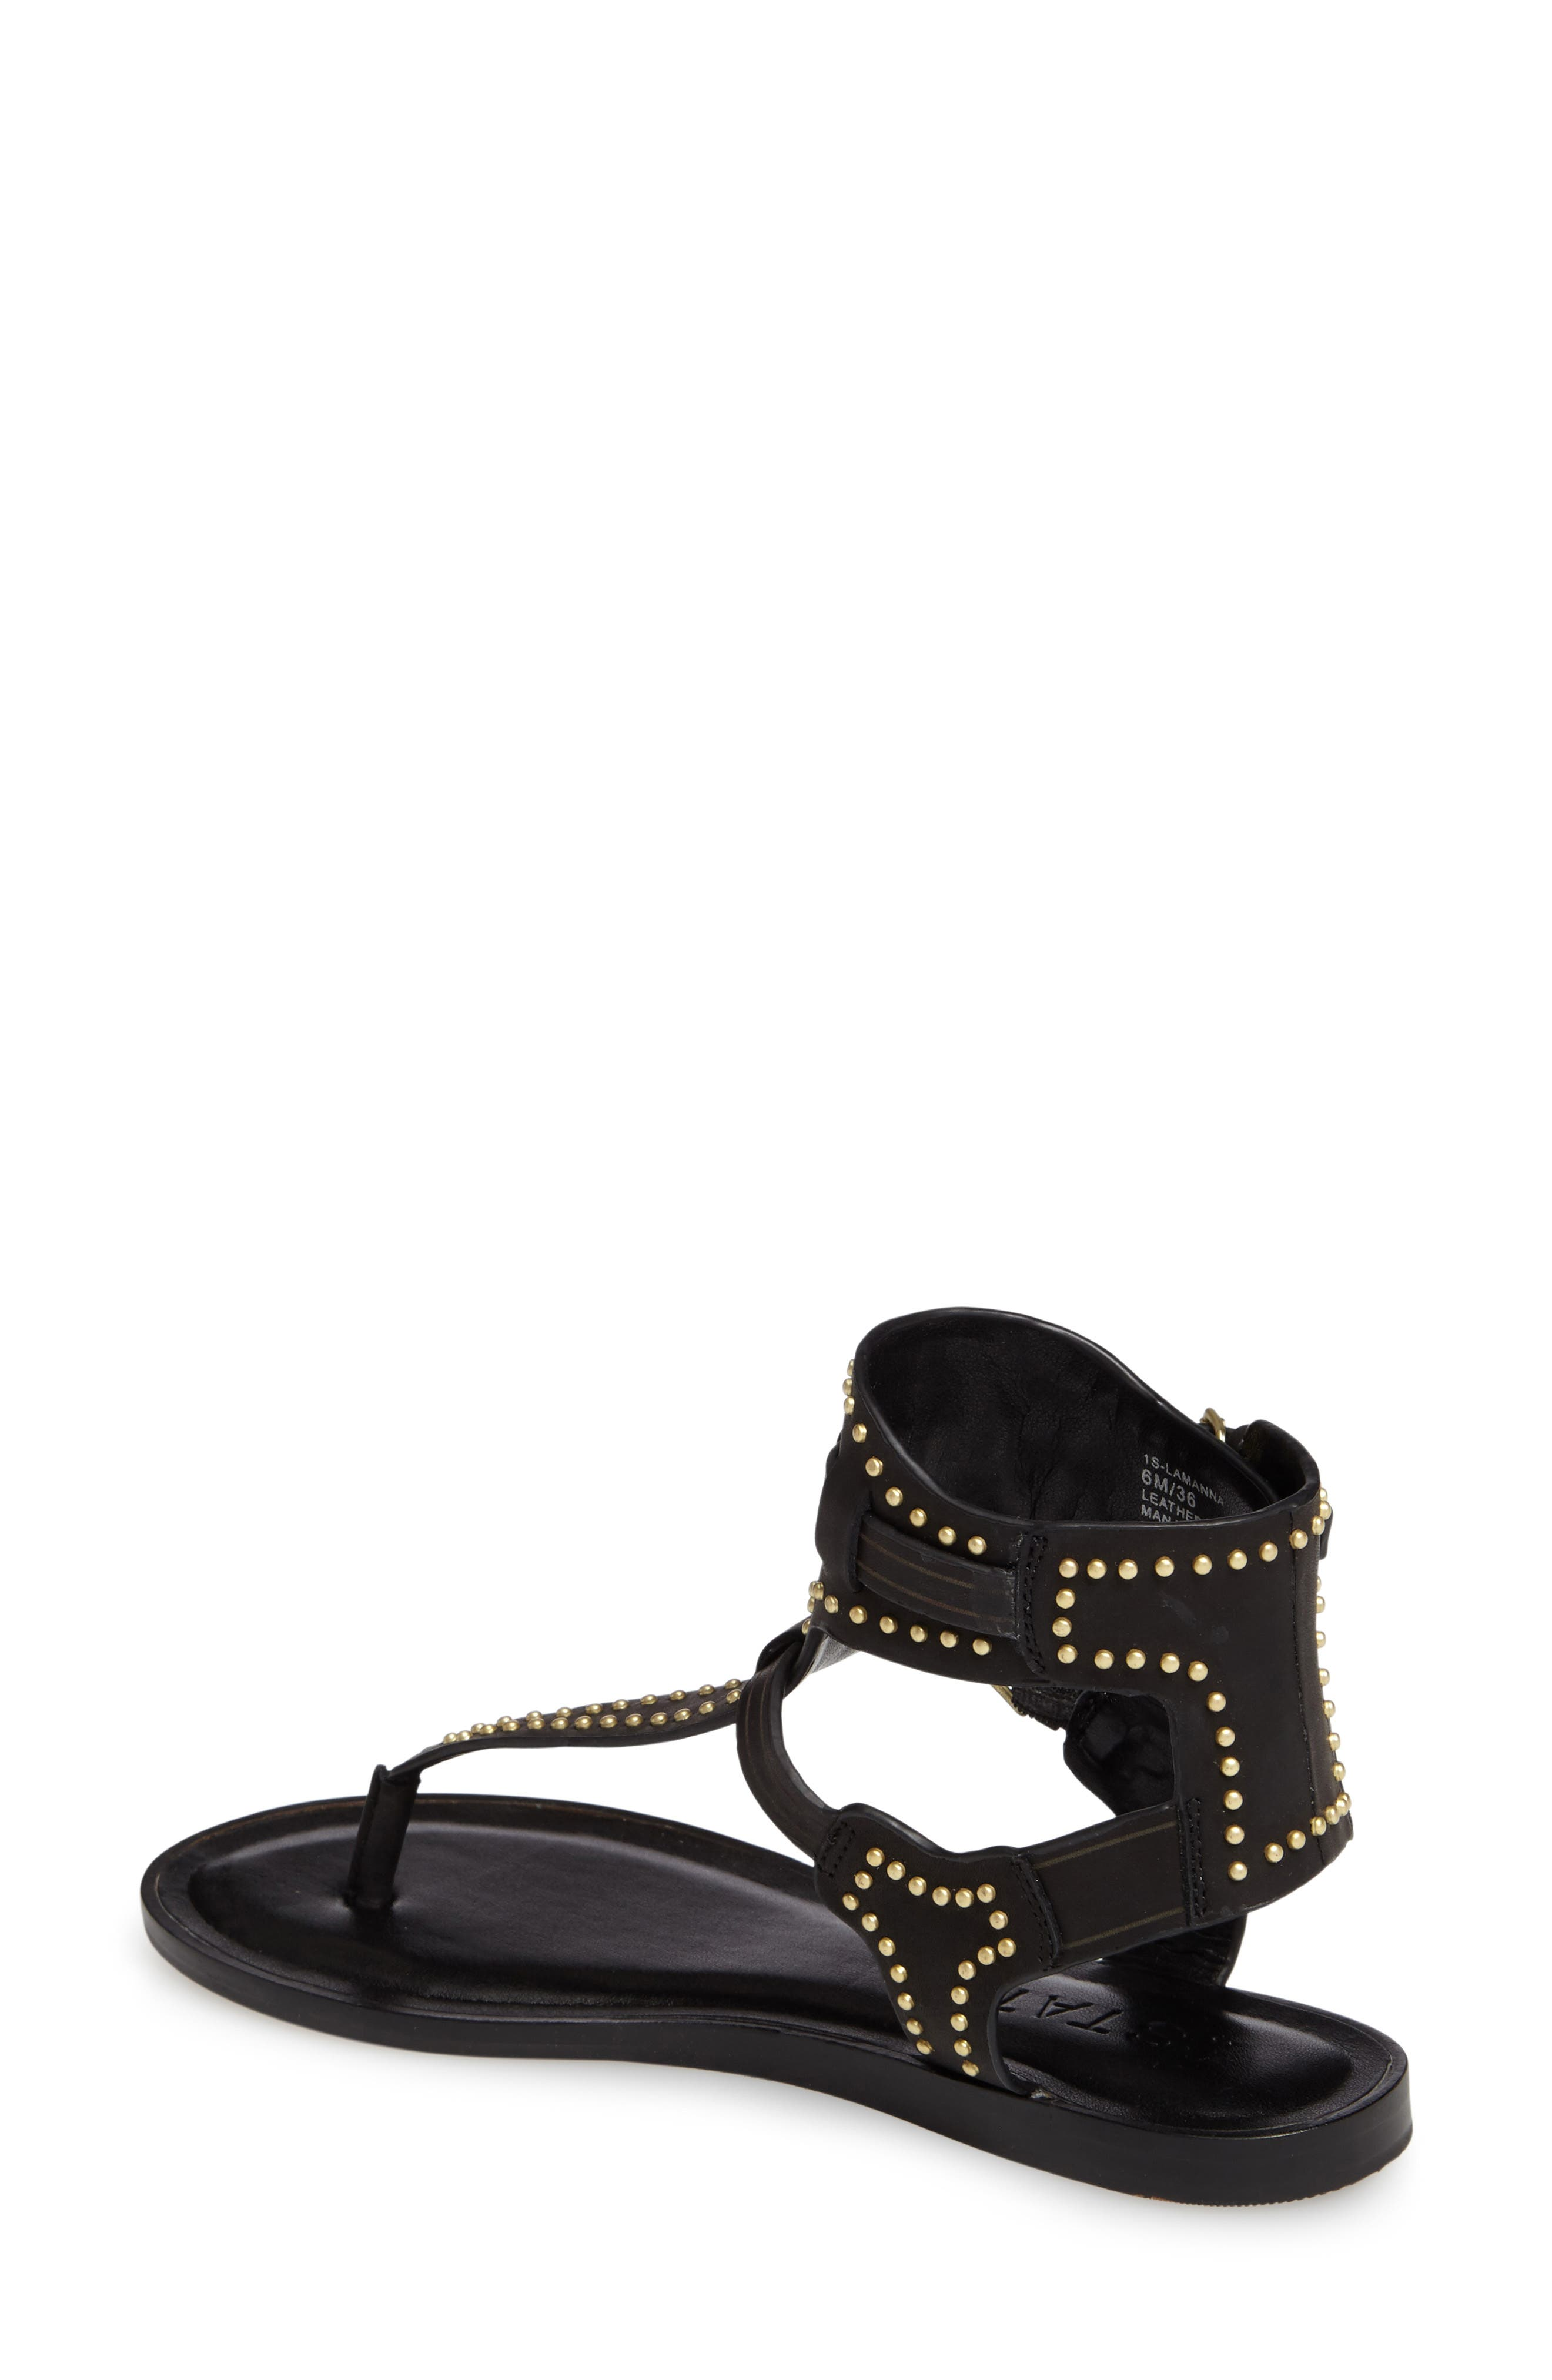 Lamanna Ankle Strap Sandal,                             Alternate thumbnail 2, color,                             001